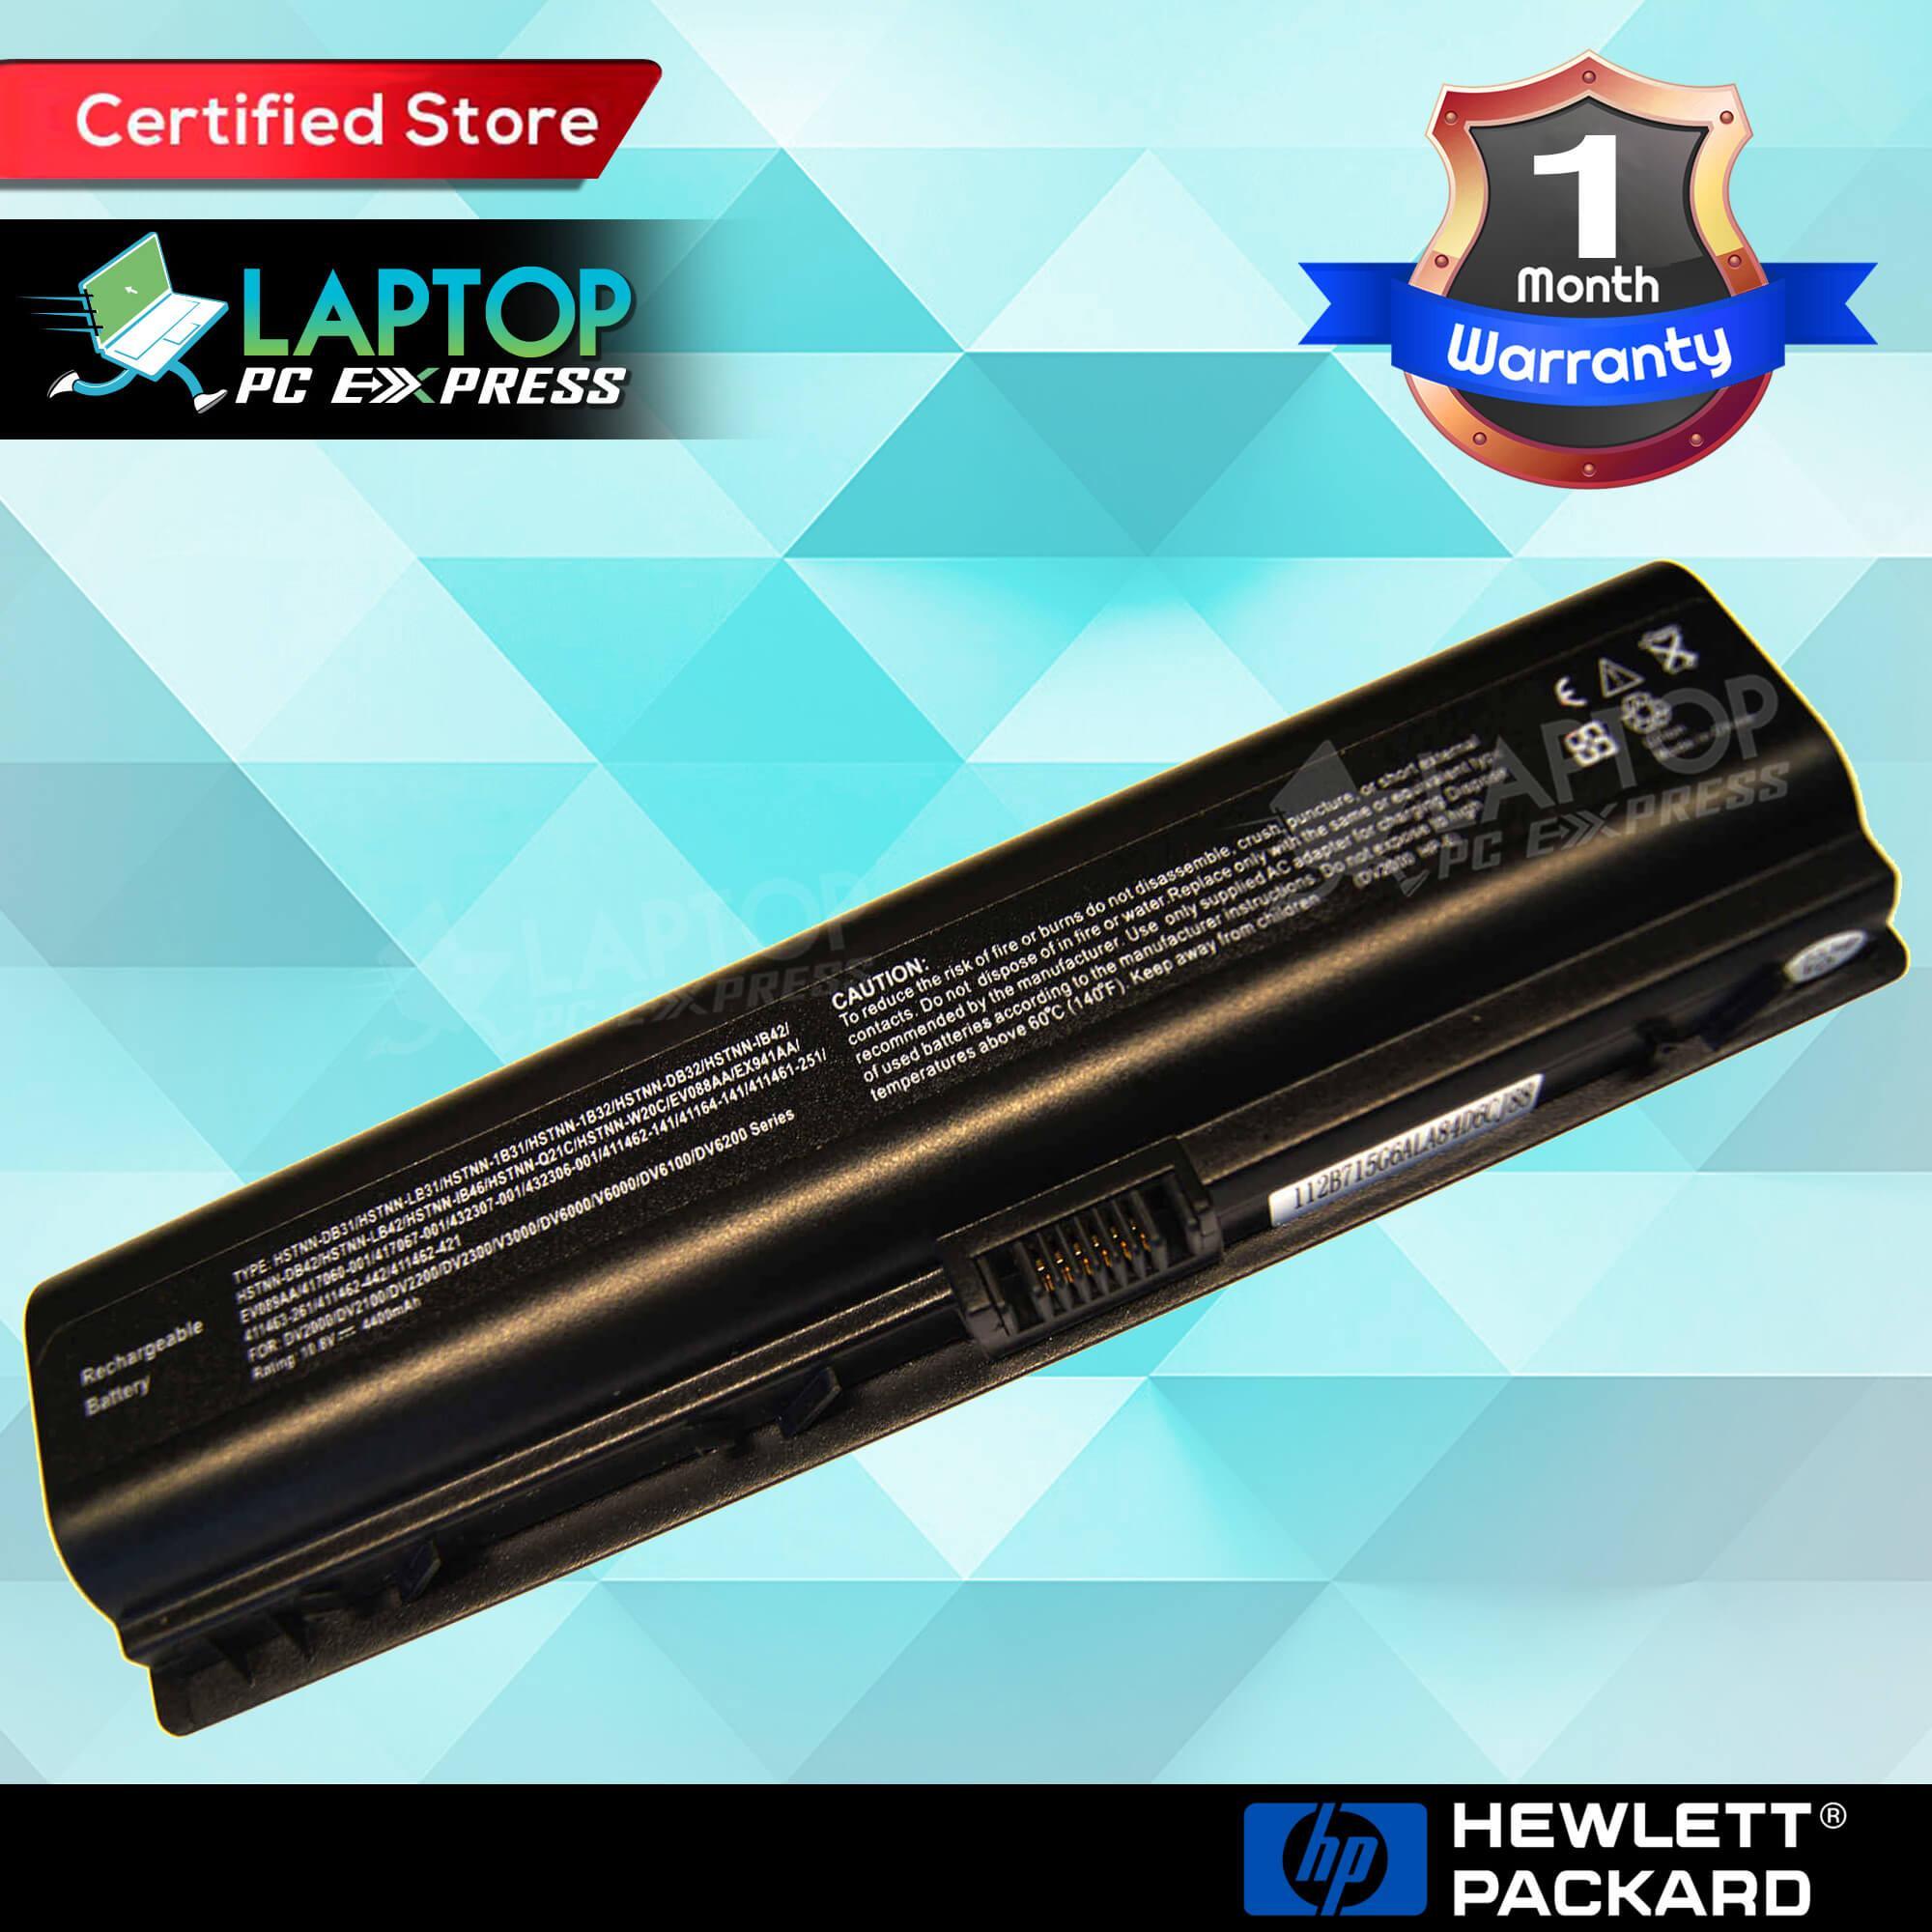 HP Laptop Battery HSTNN-DB31HSTNN-DB42 HSTNN-DB46 HSTNN-IB31HSTNN-IB32HSTNN